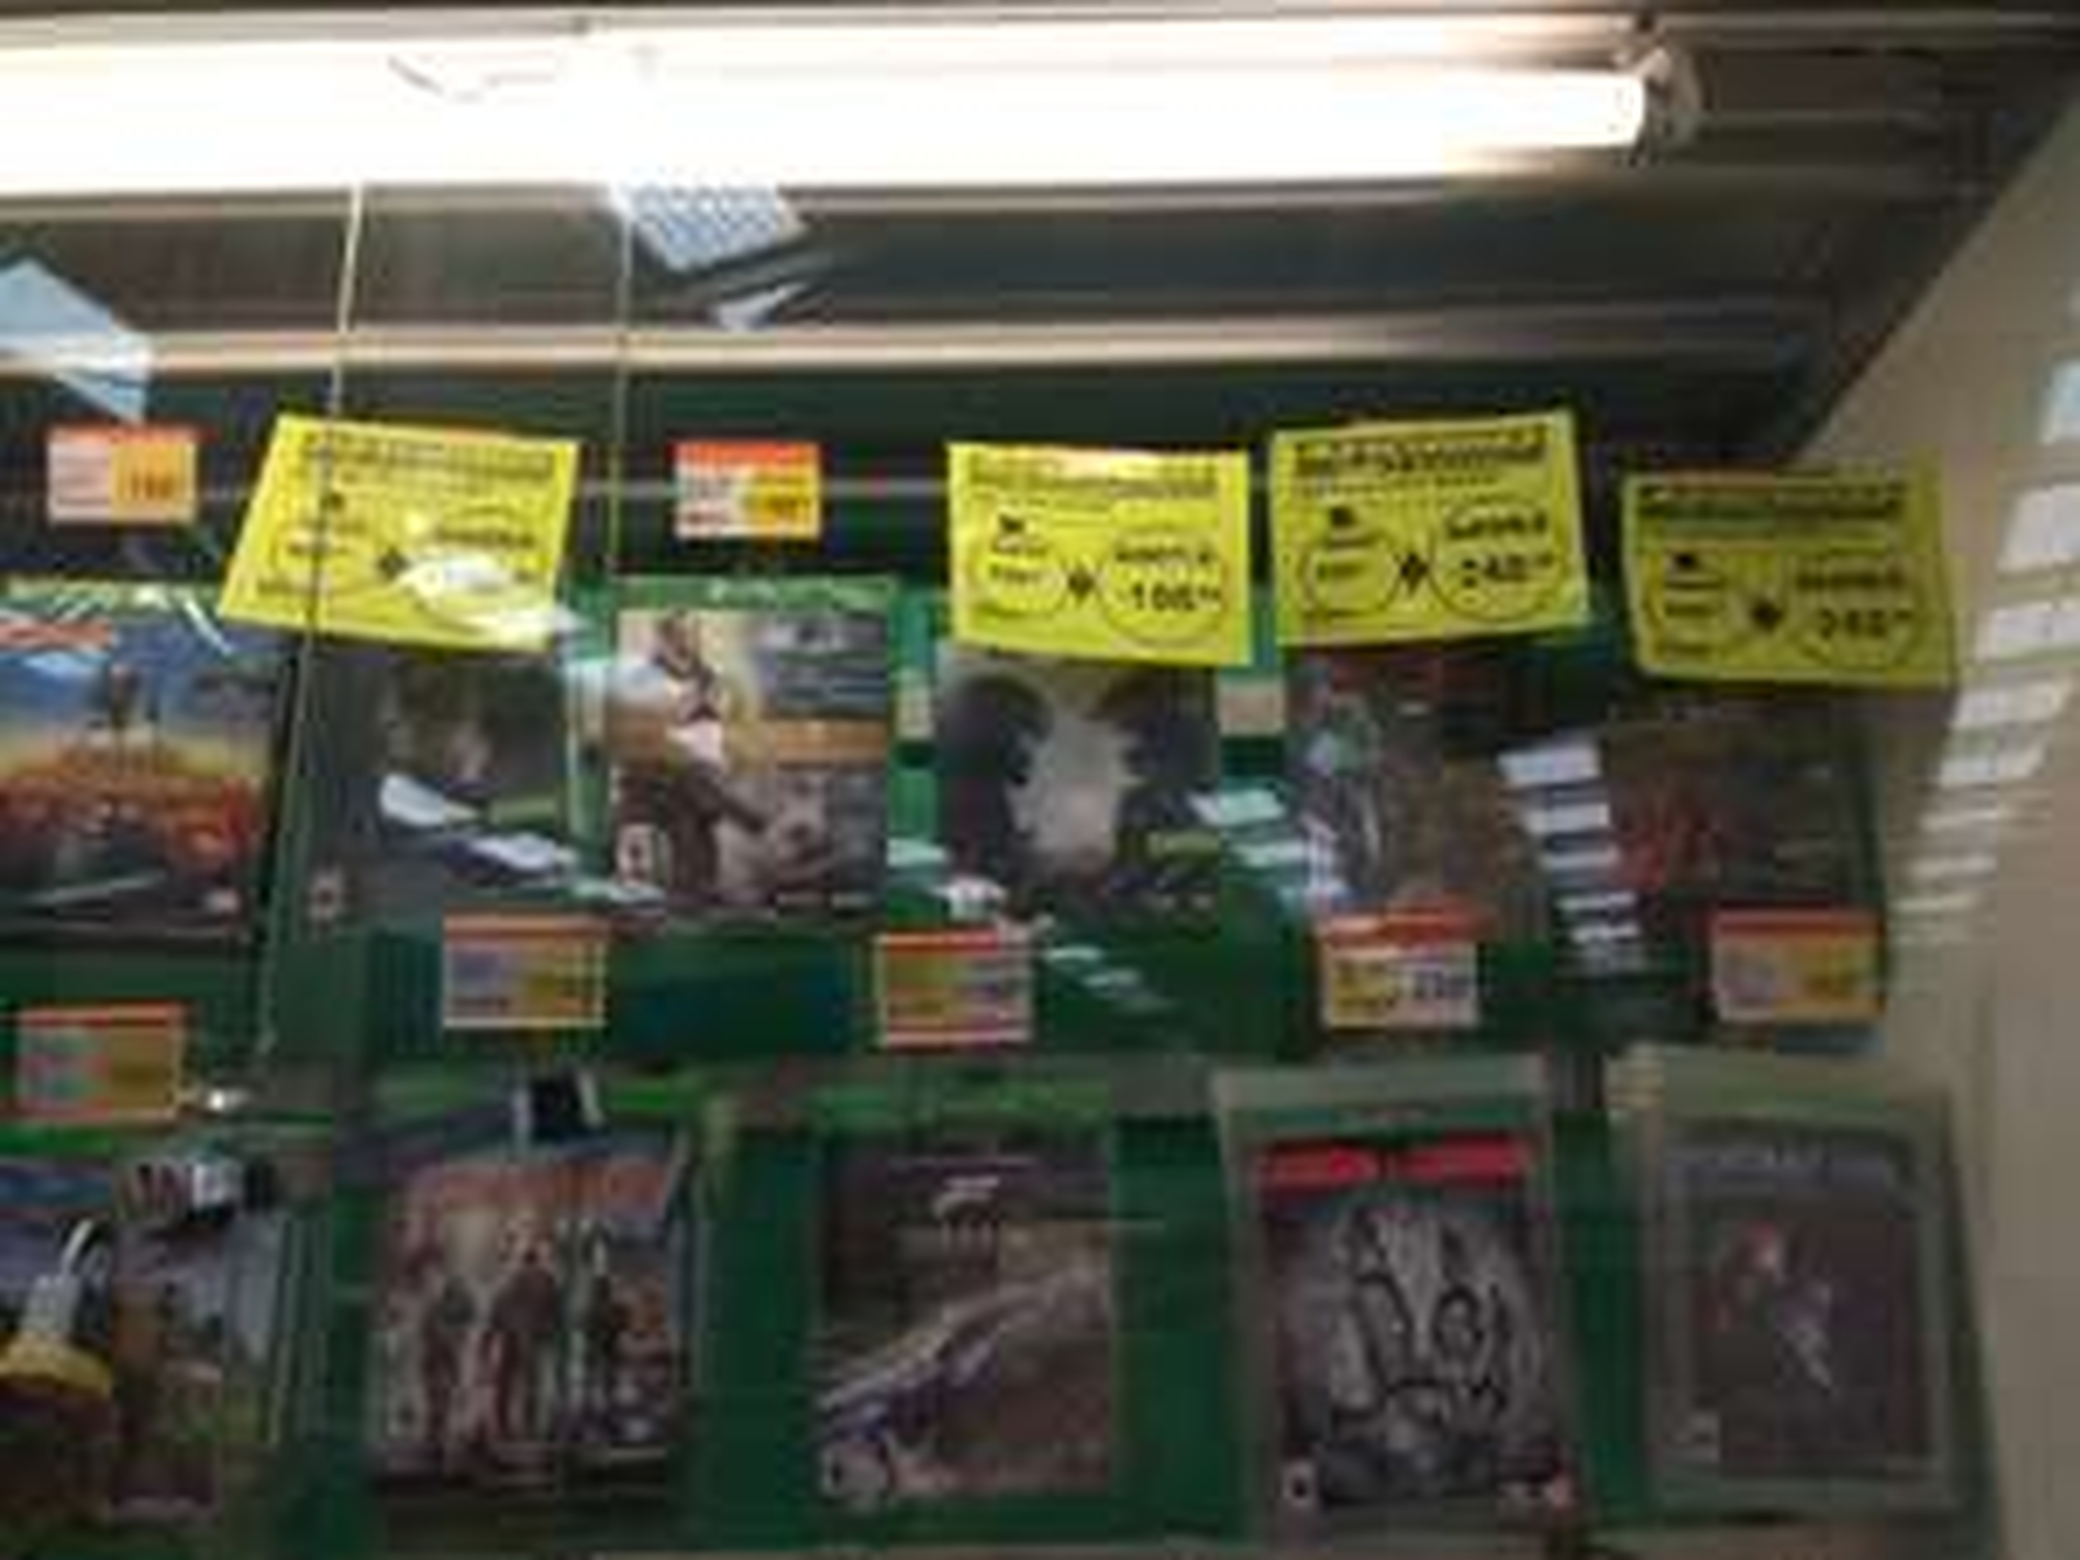 Comercial Mexicana: Varios Videojuegos en Oferta (ej. Halo MCC Xbox $148)